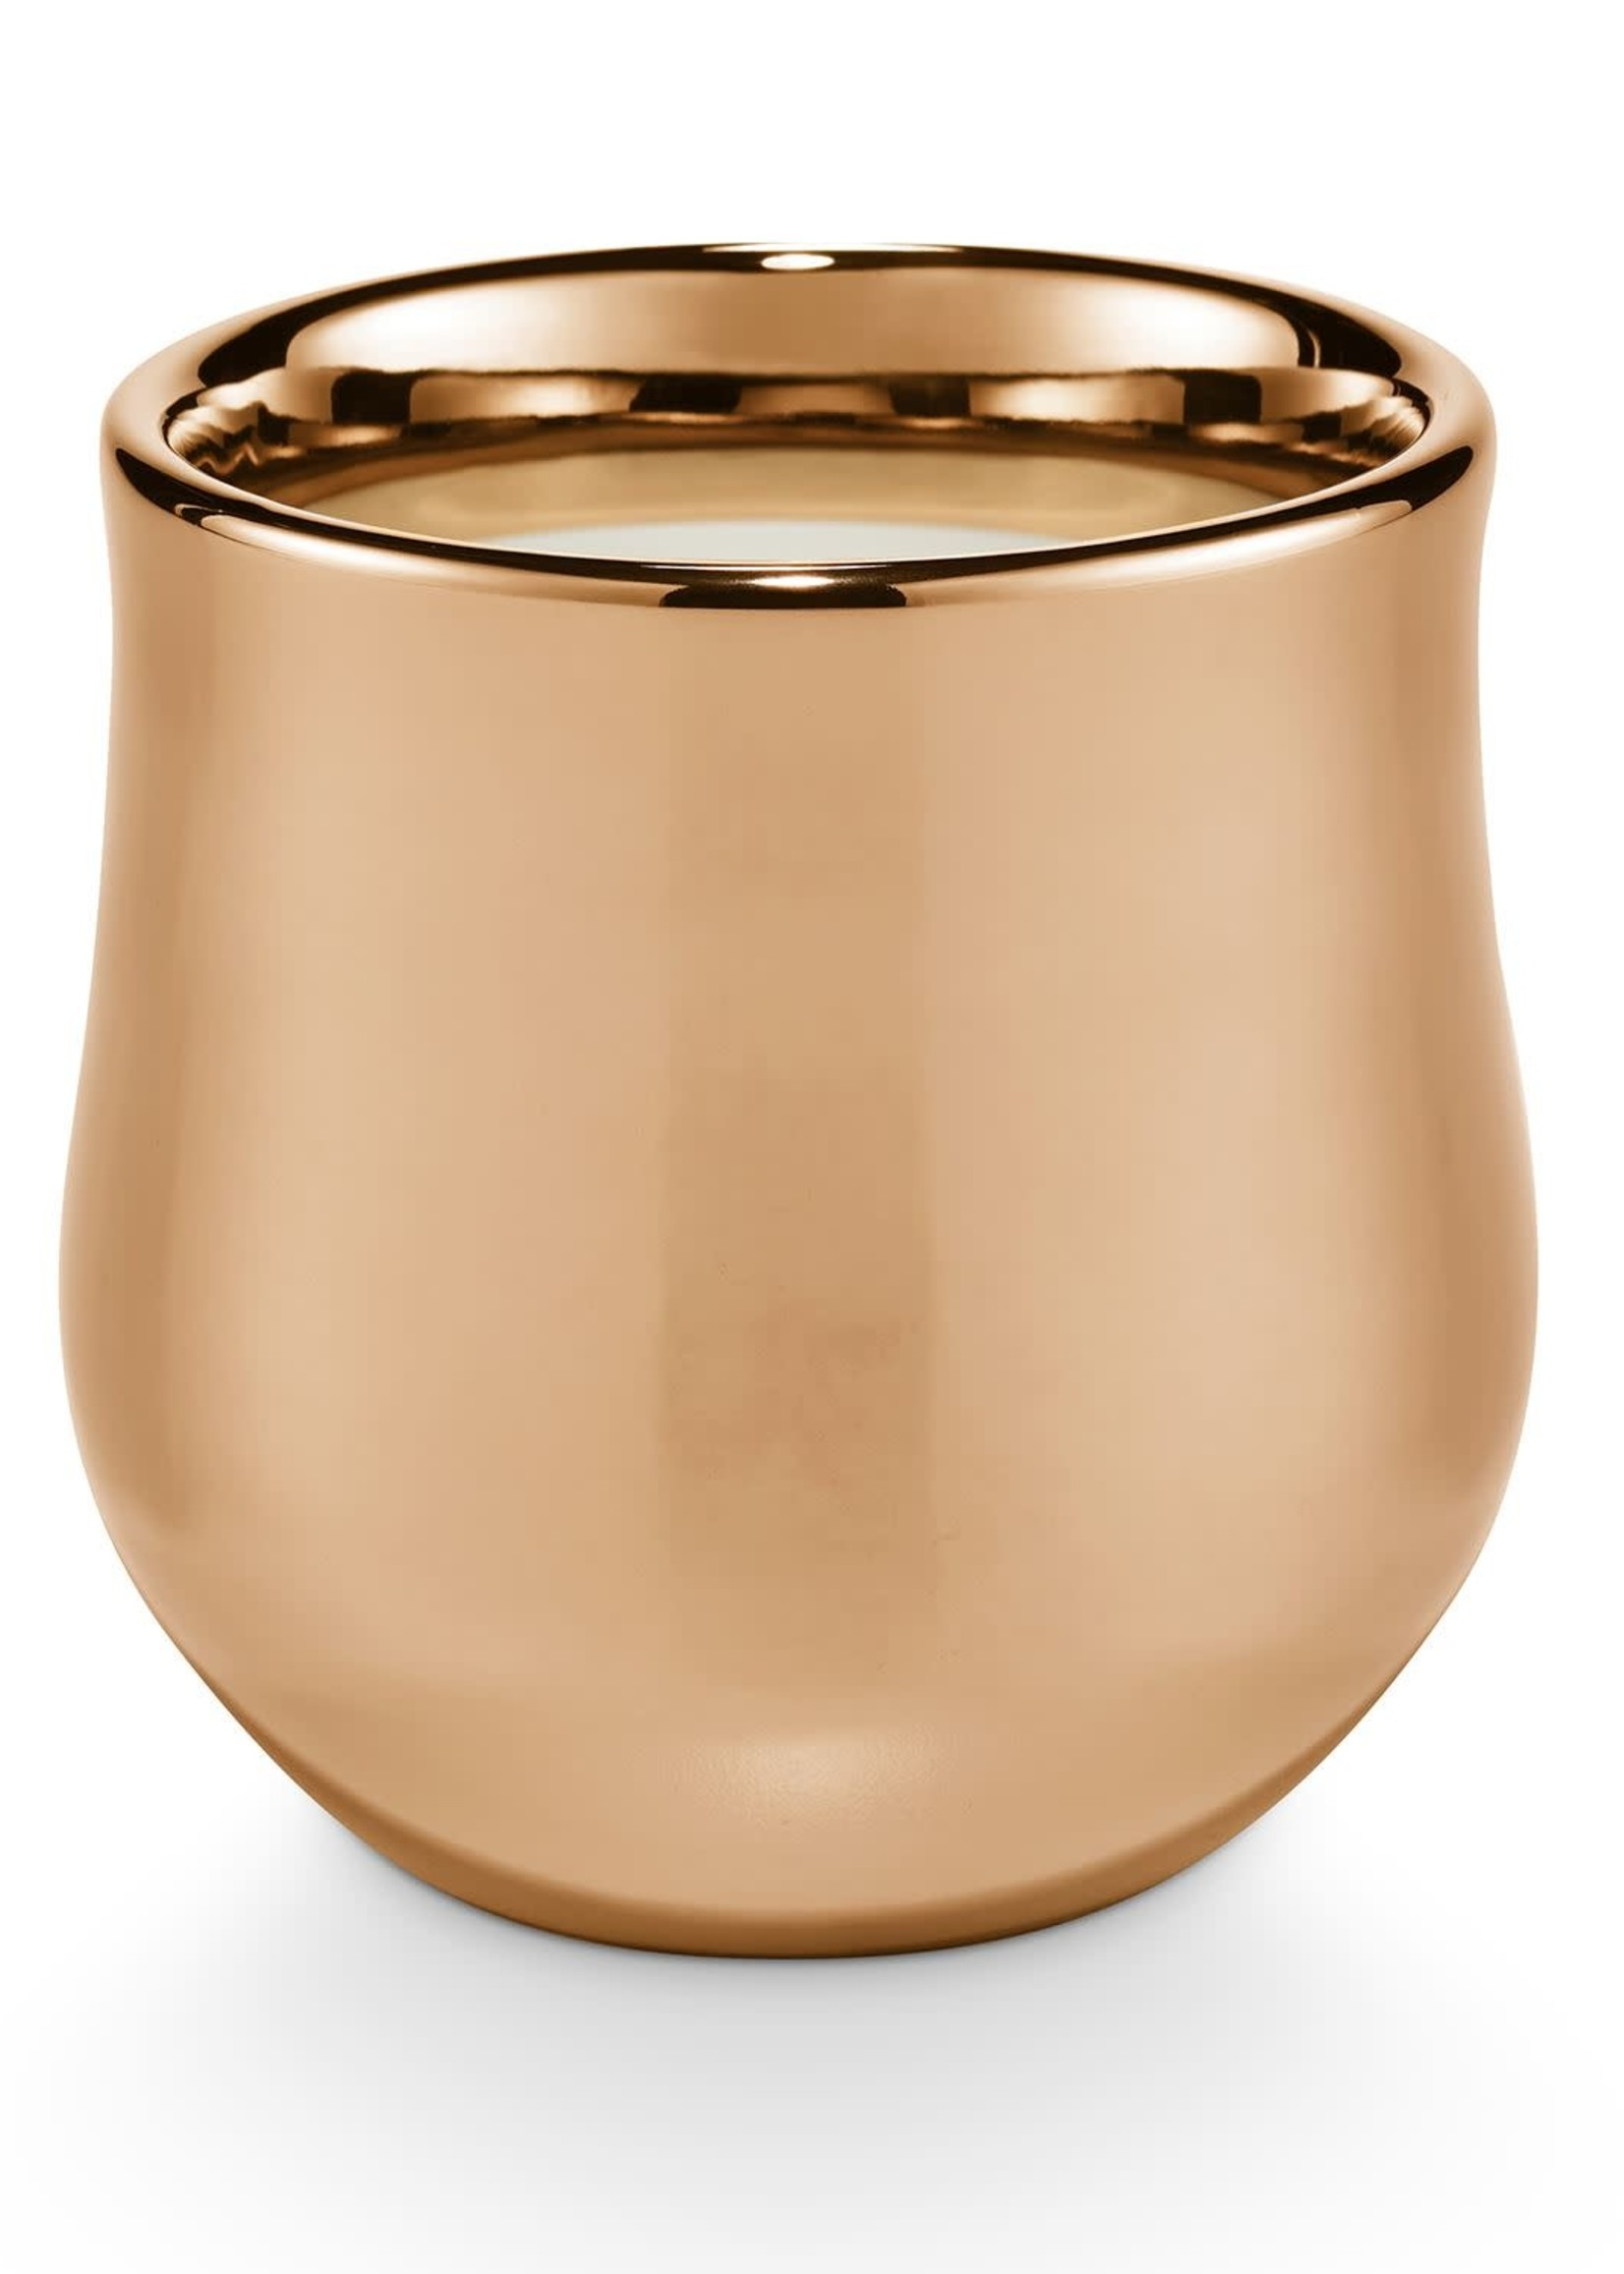 Illume Copper Leaves Gilded Ceramic Candle